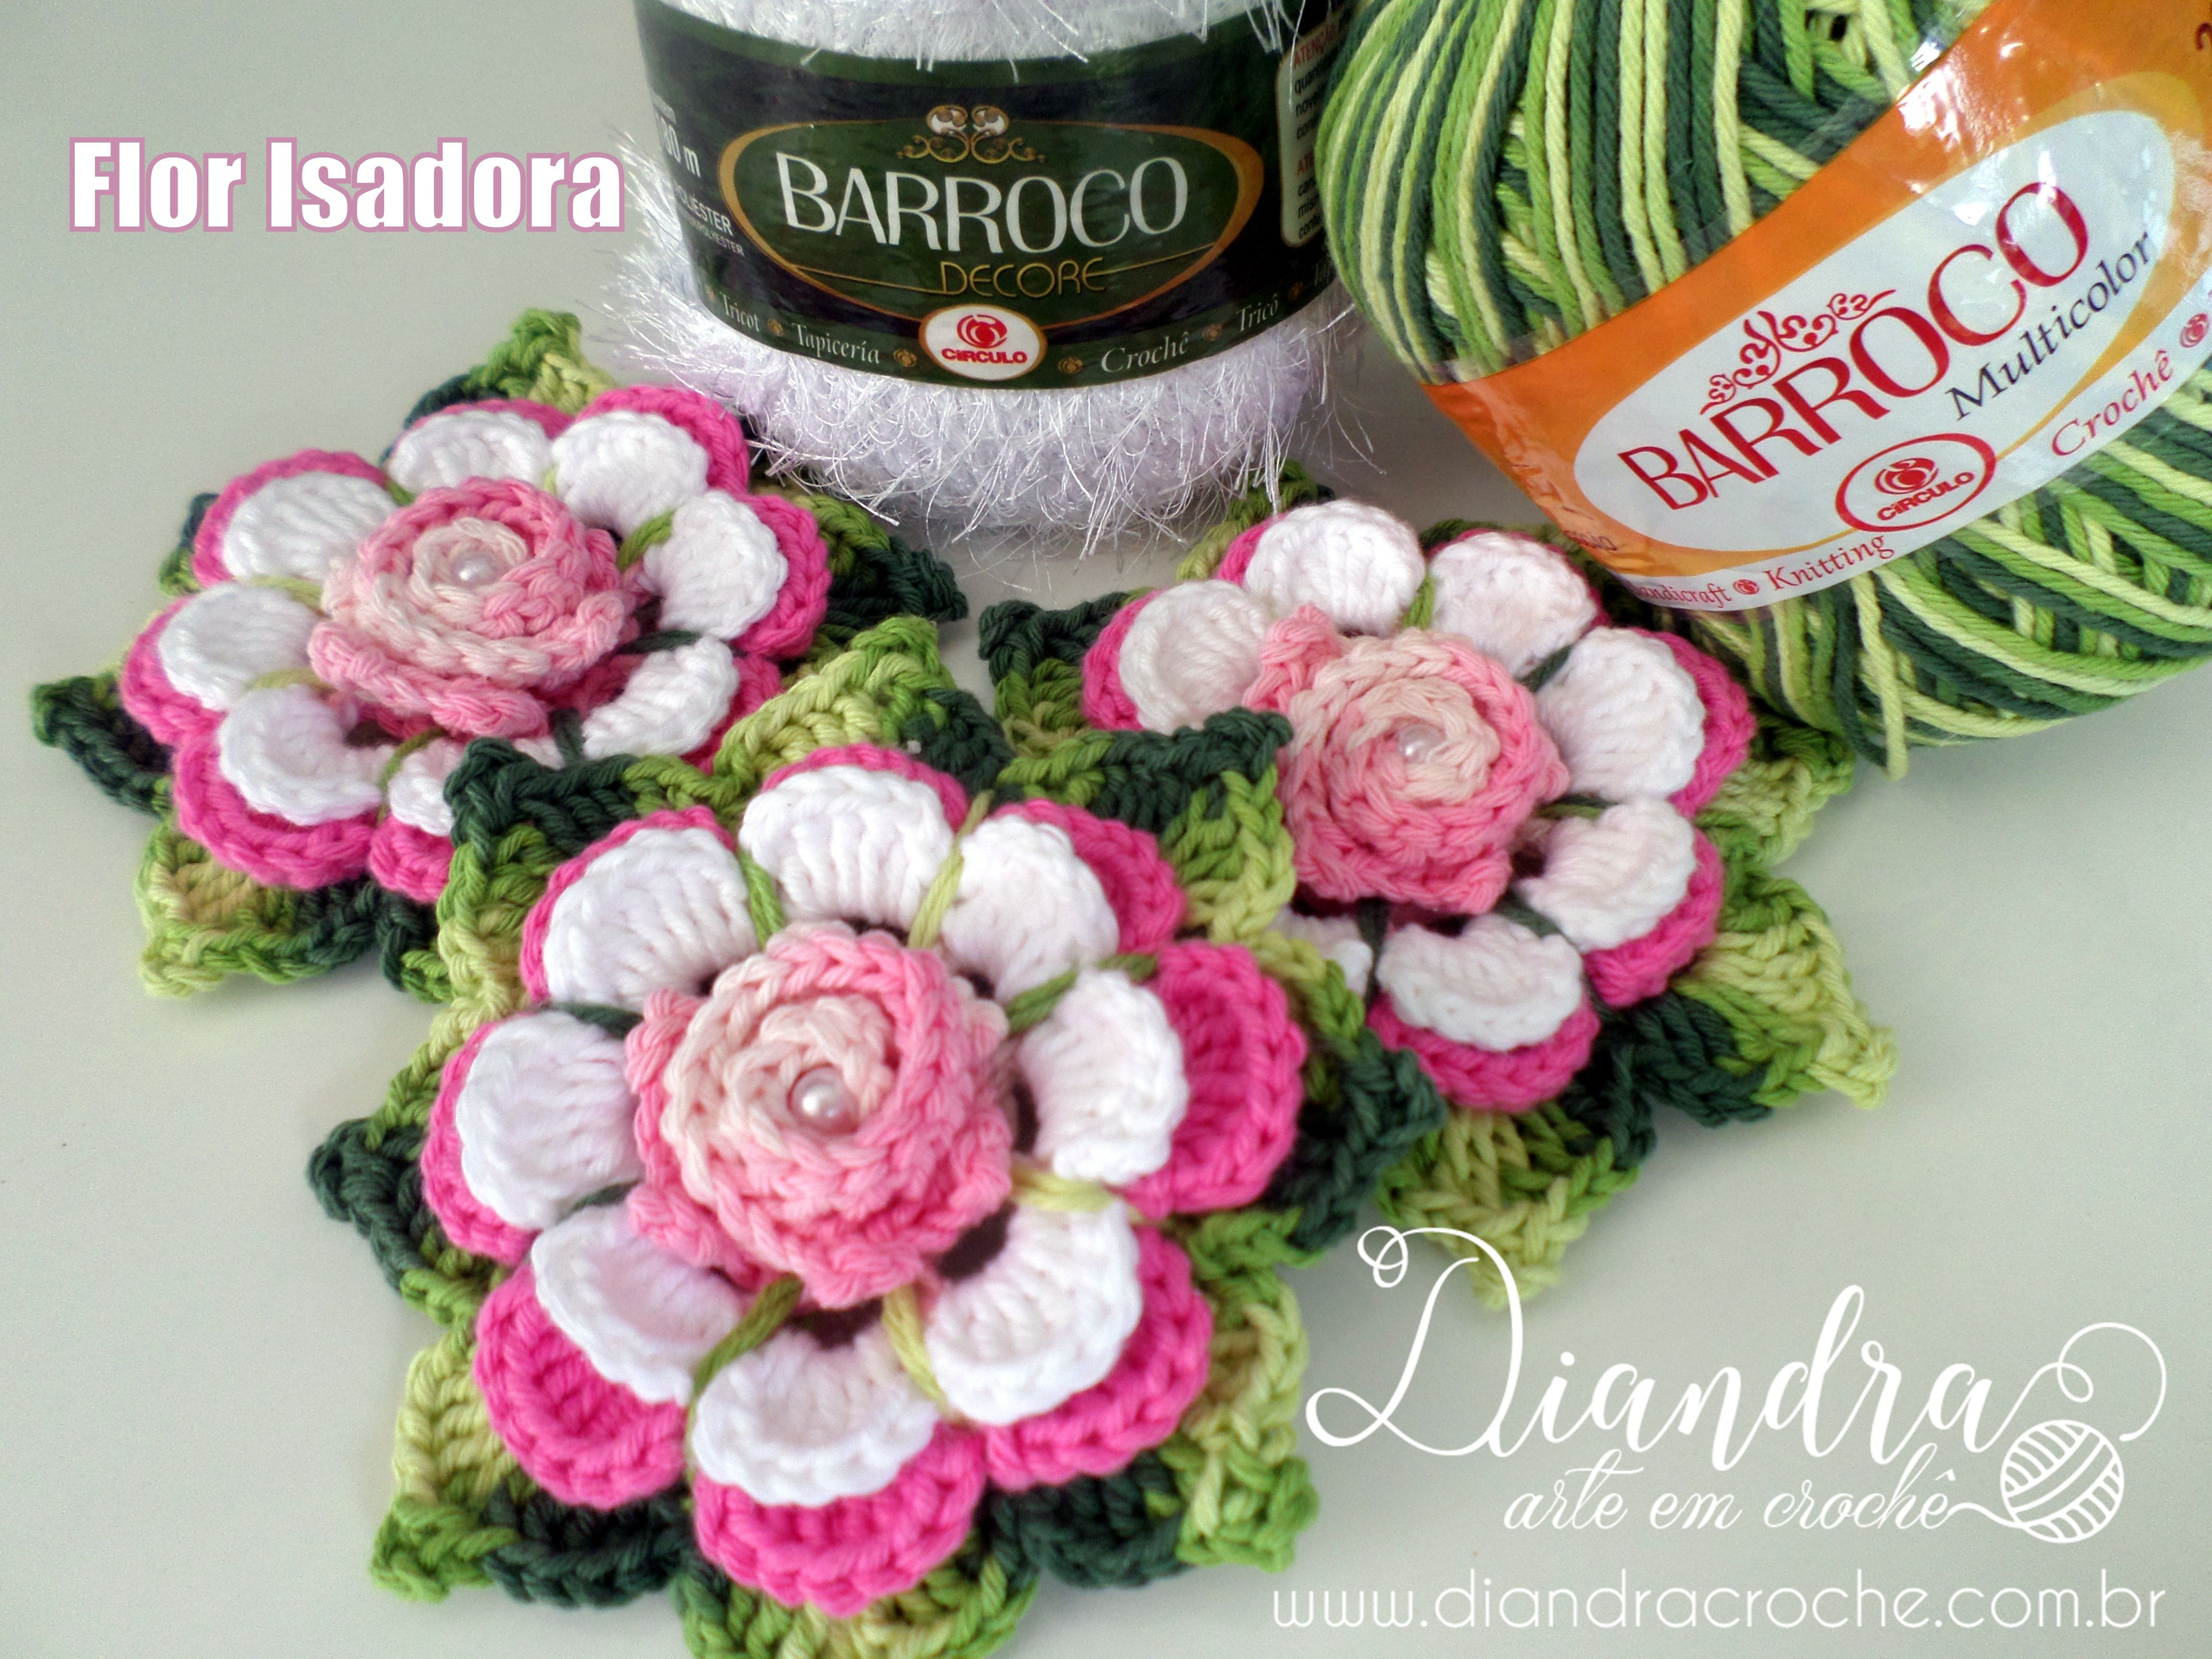 Flor Isadora Pap em www.diandracroche.com.br